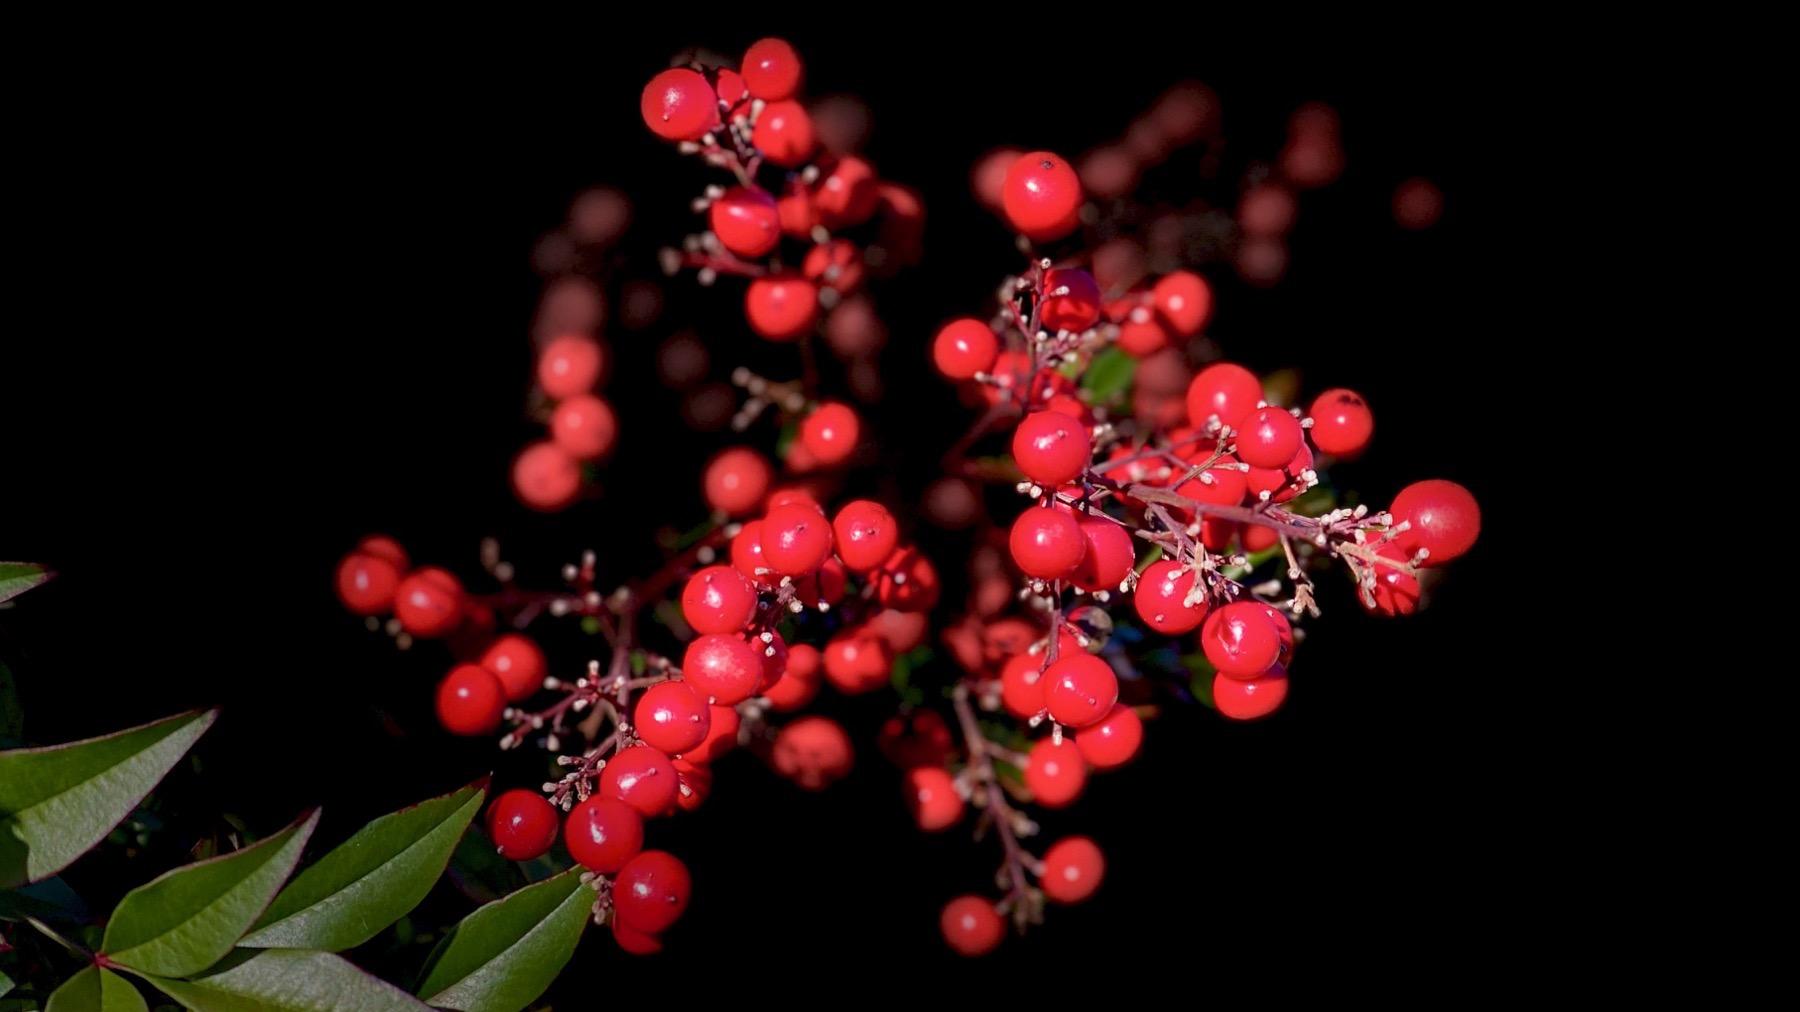 Nandina berries